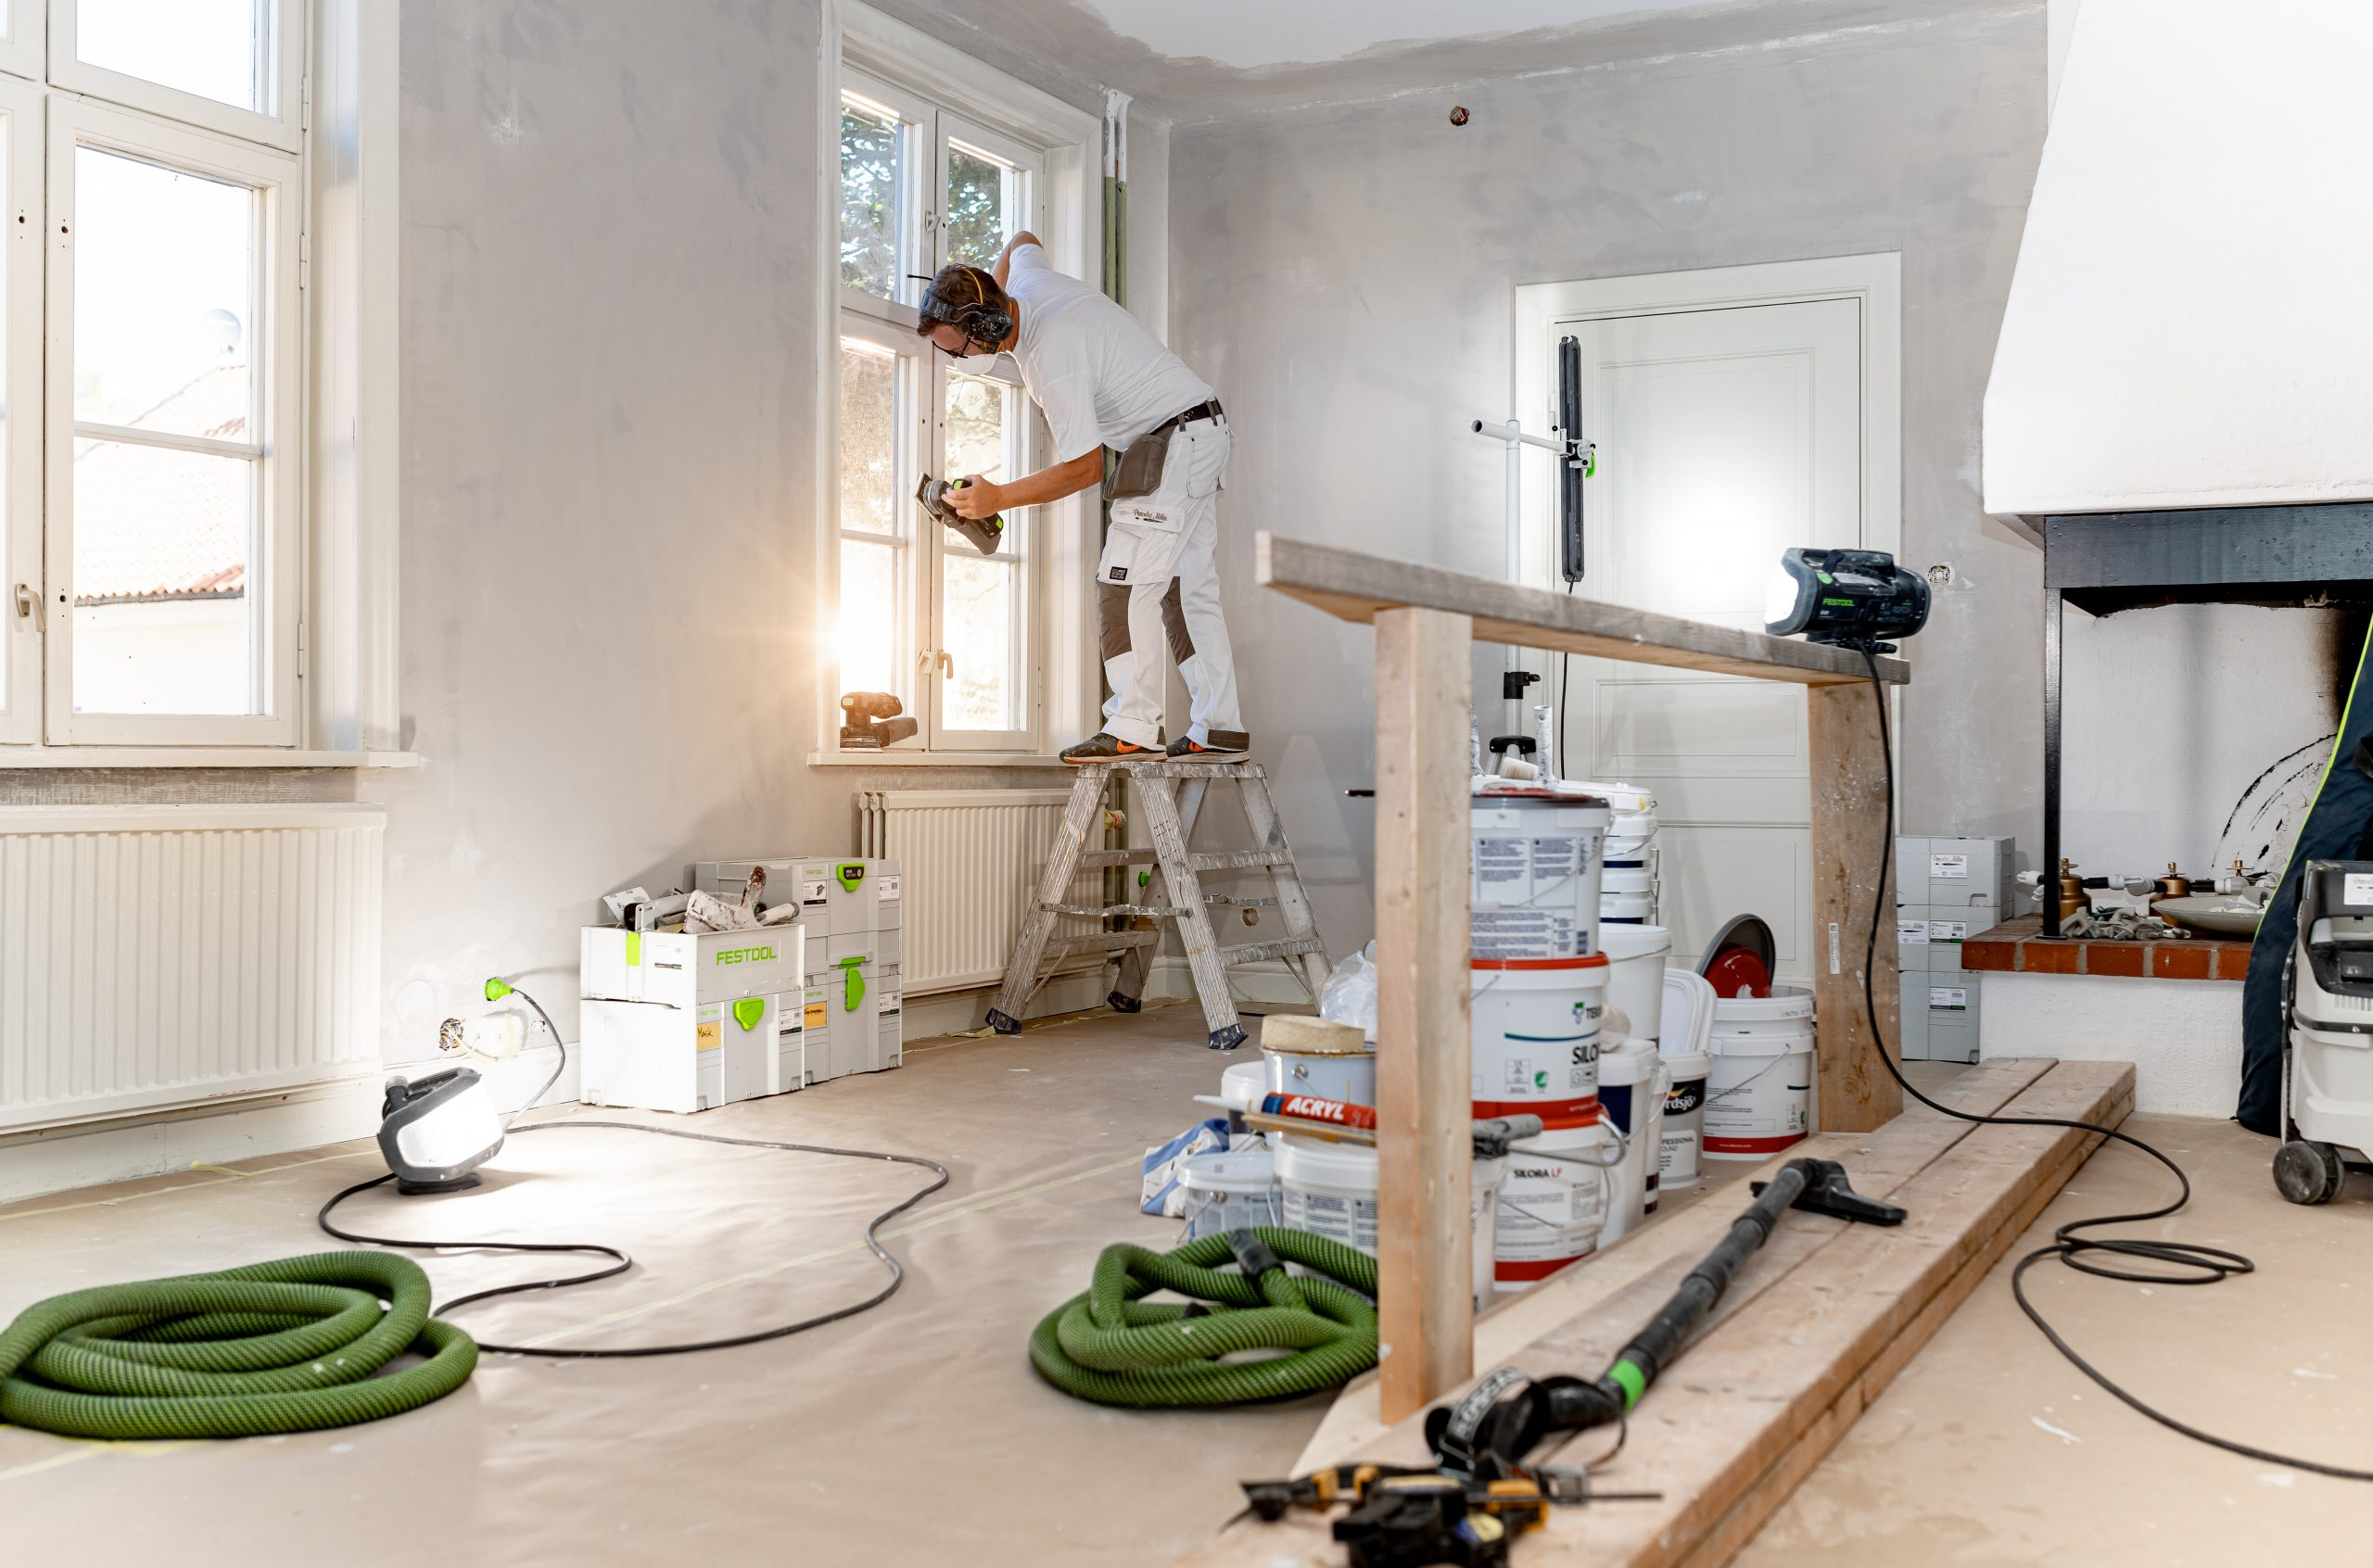 Worker, Festool, Painter, Sunshine, Paint